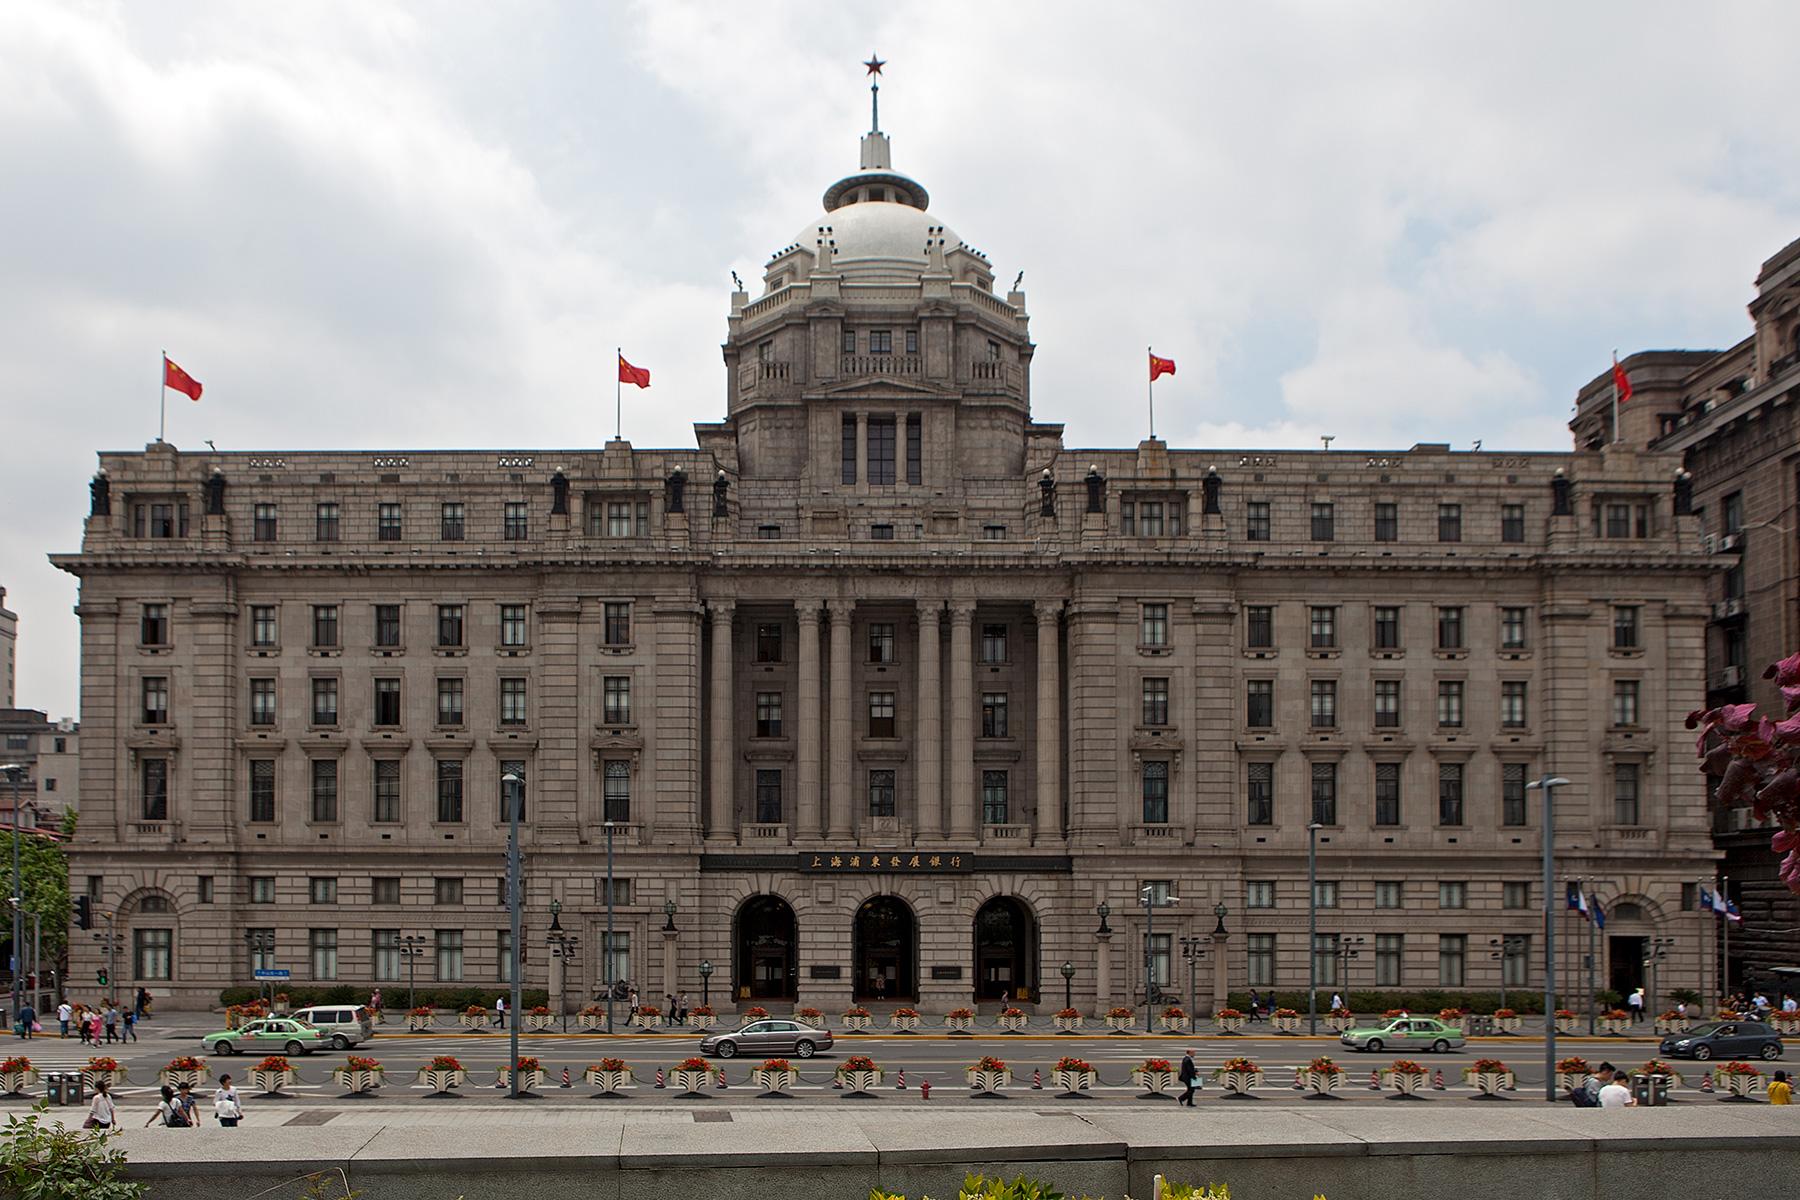 Klassizistisches Gebäude